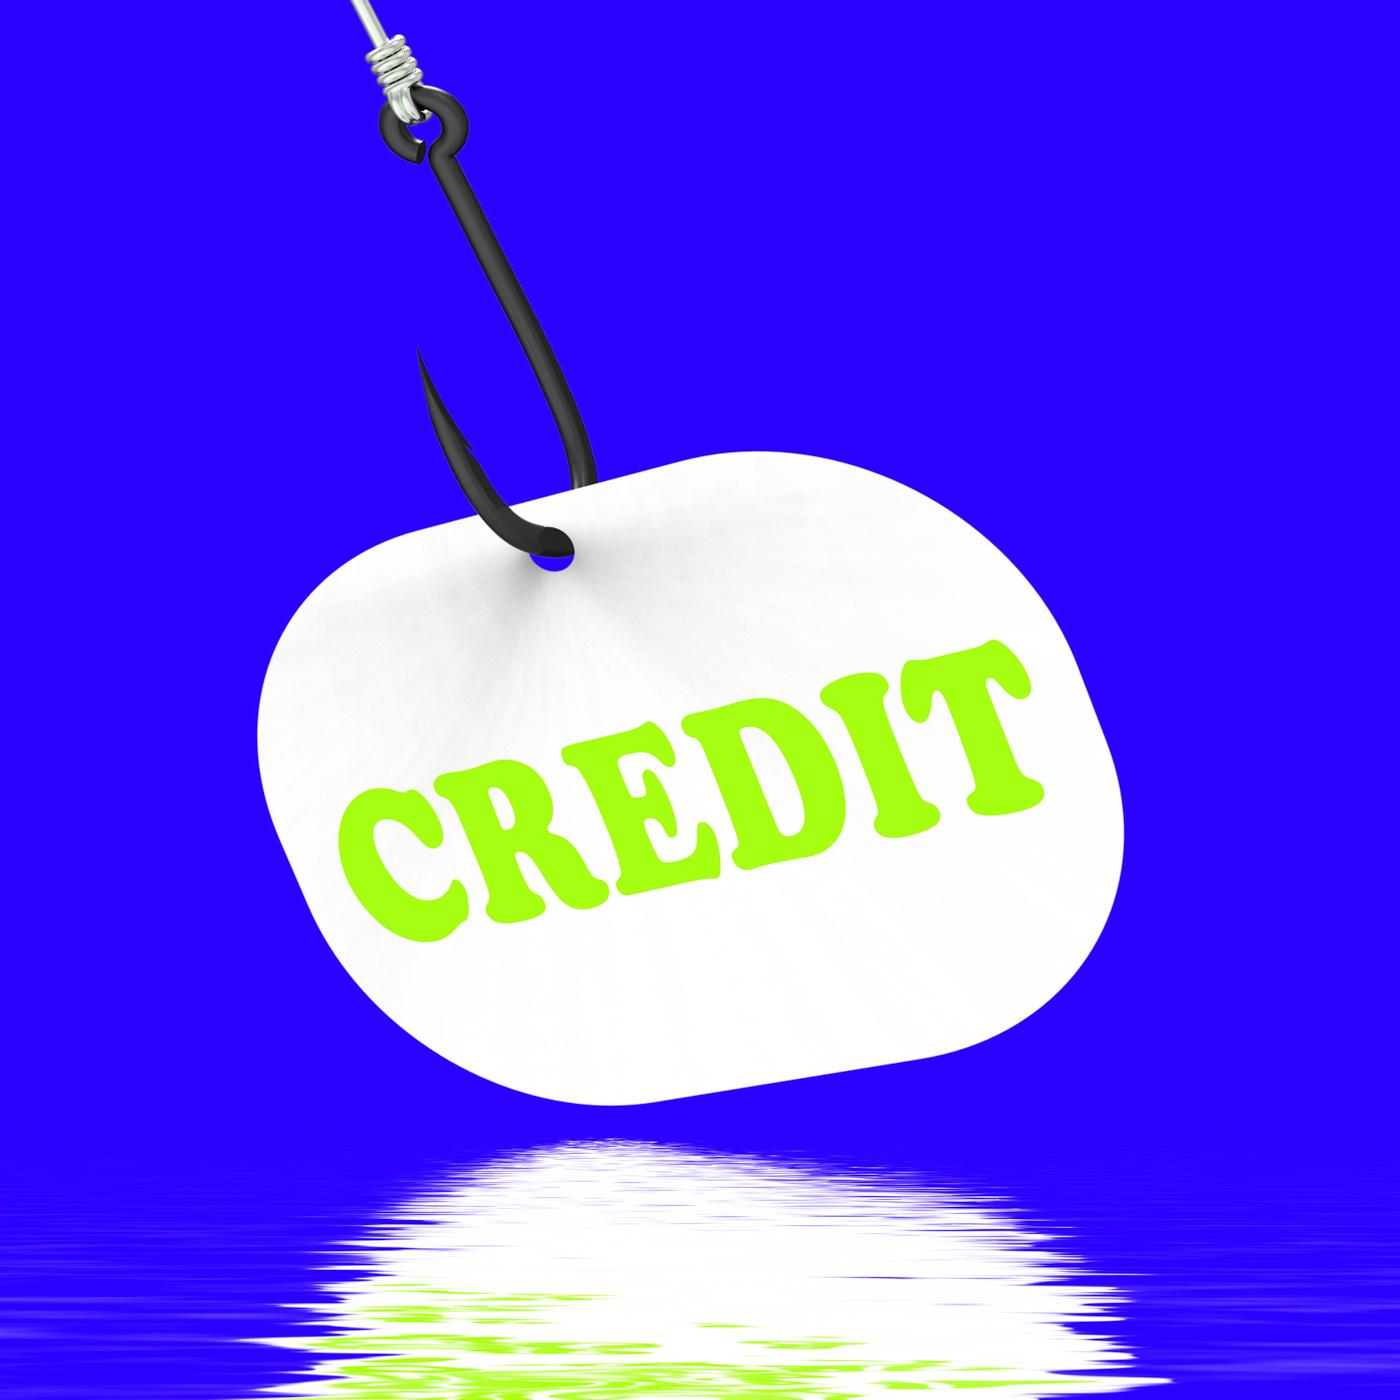 Credit on hook displays financial loan or bank money photo